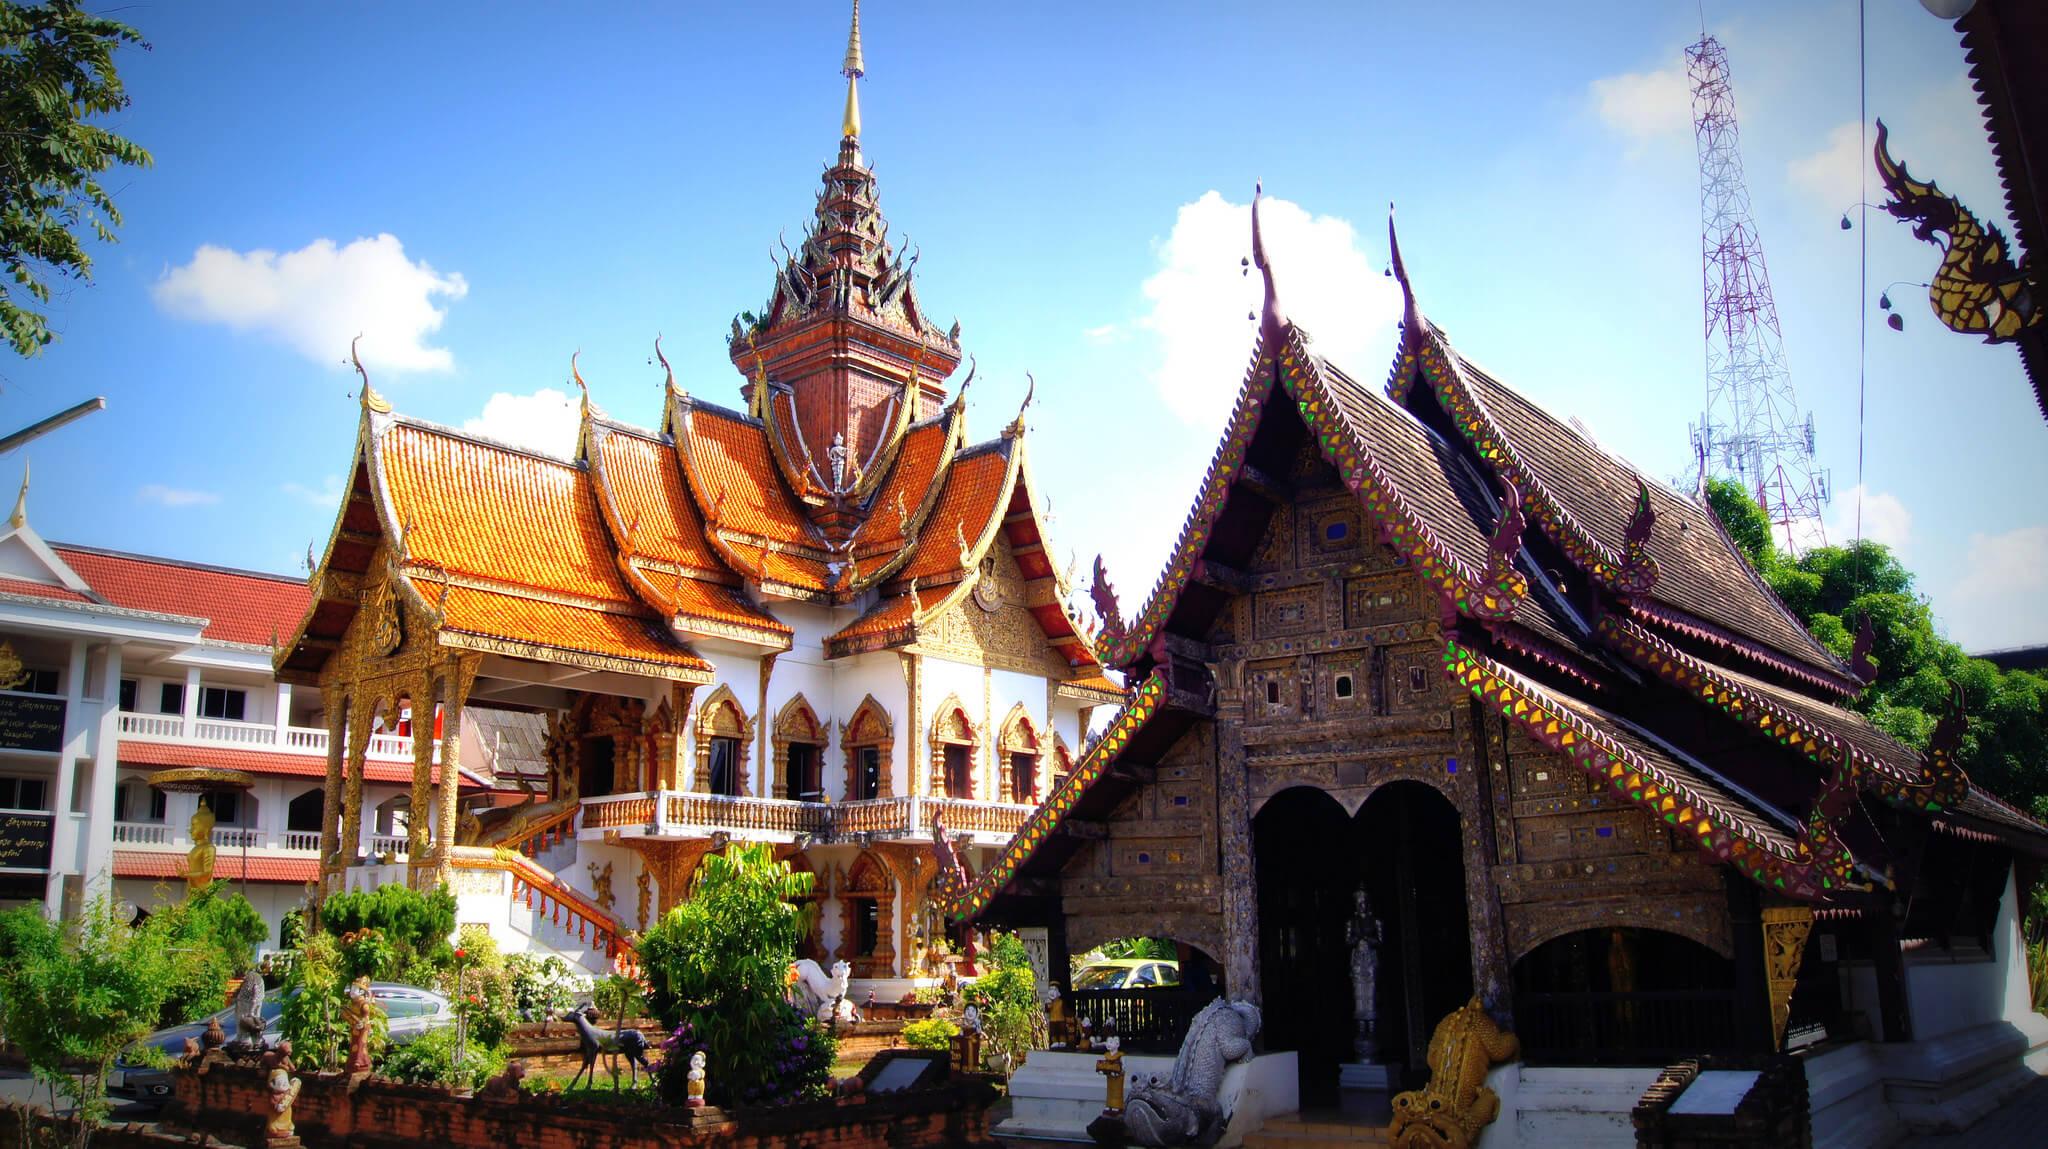 Visita-a-Chiang-Mai-Rutas-por-Tailandia